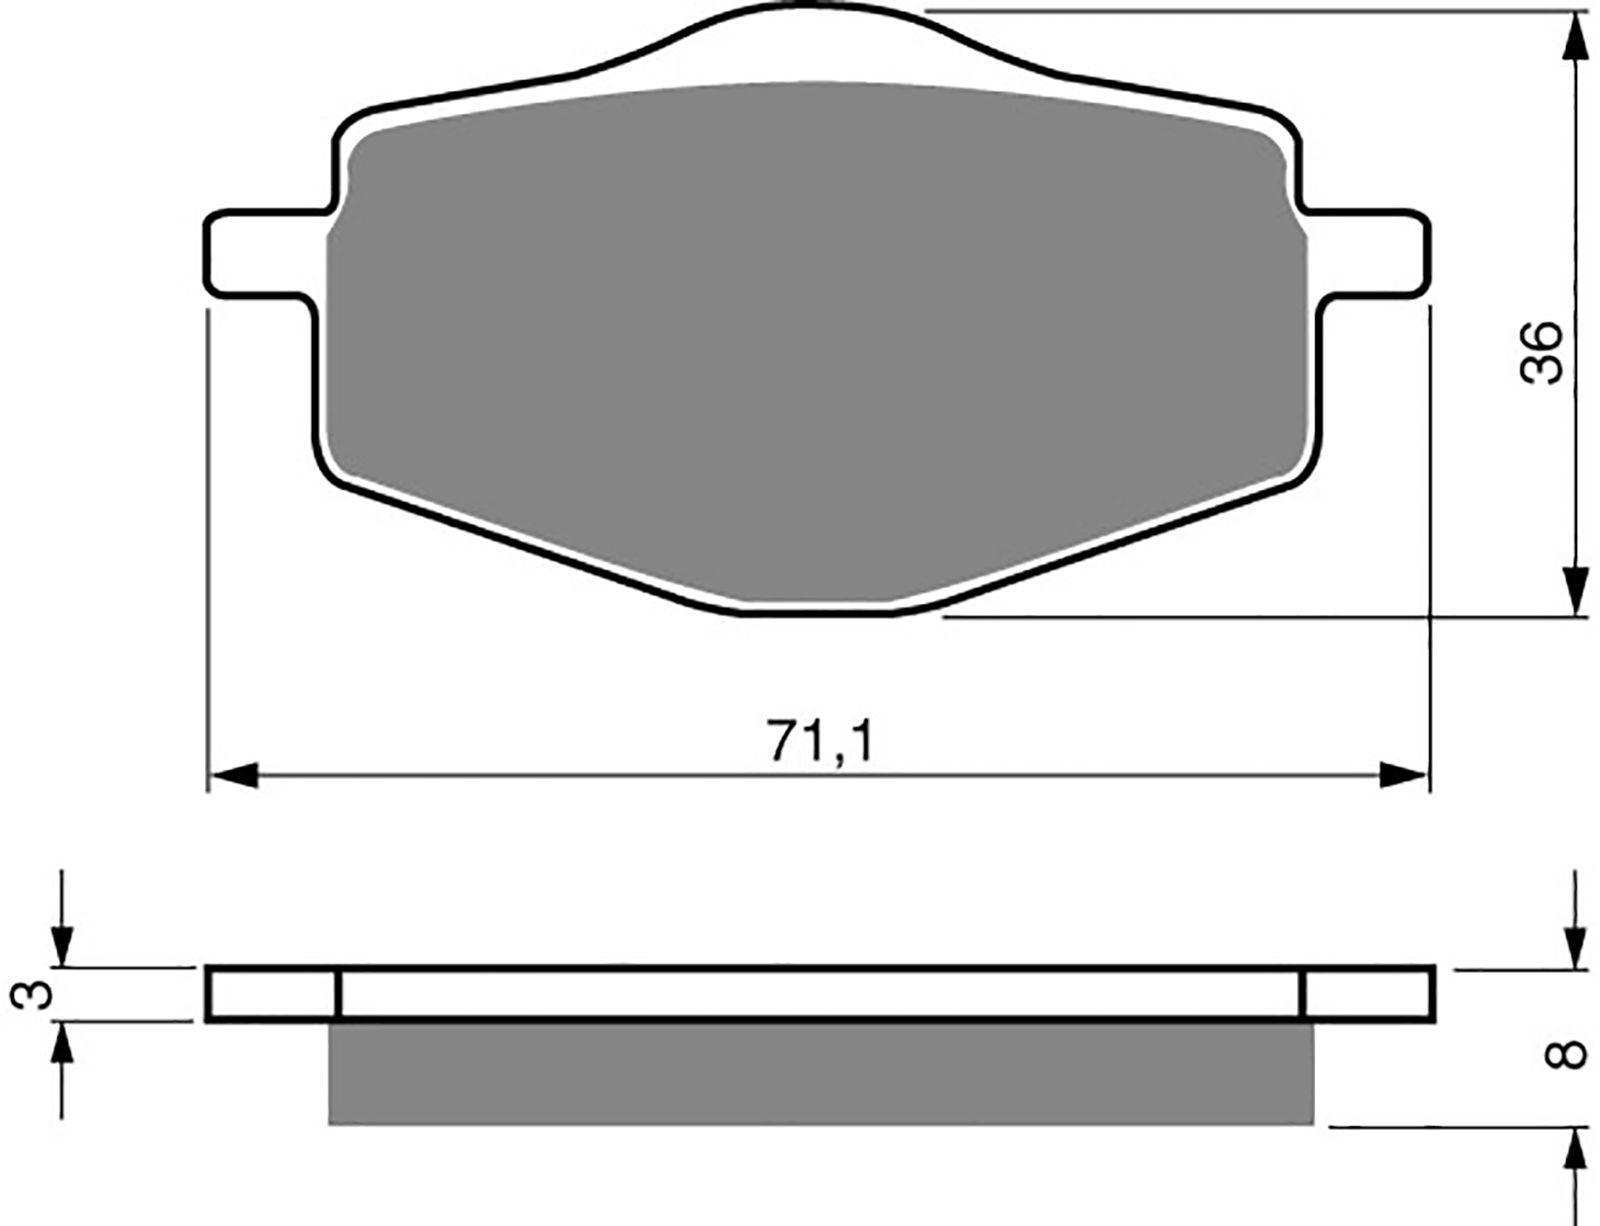 goldfren s33 brake pads - 700018GS image